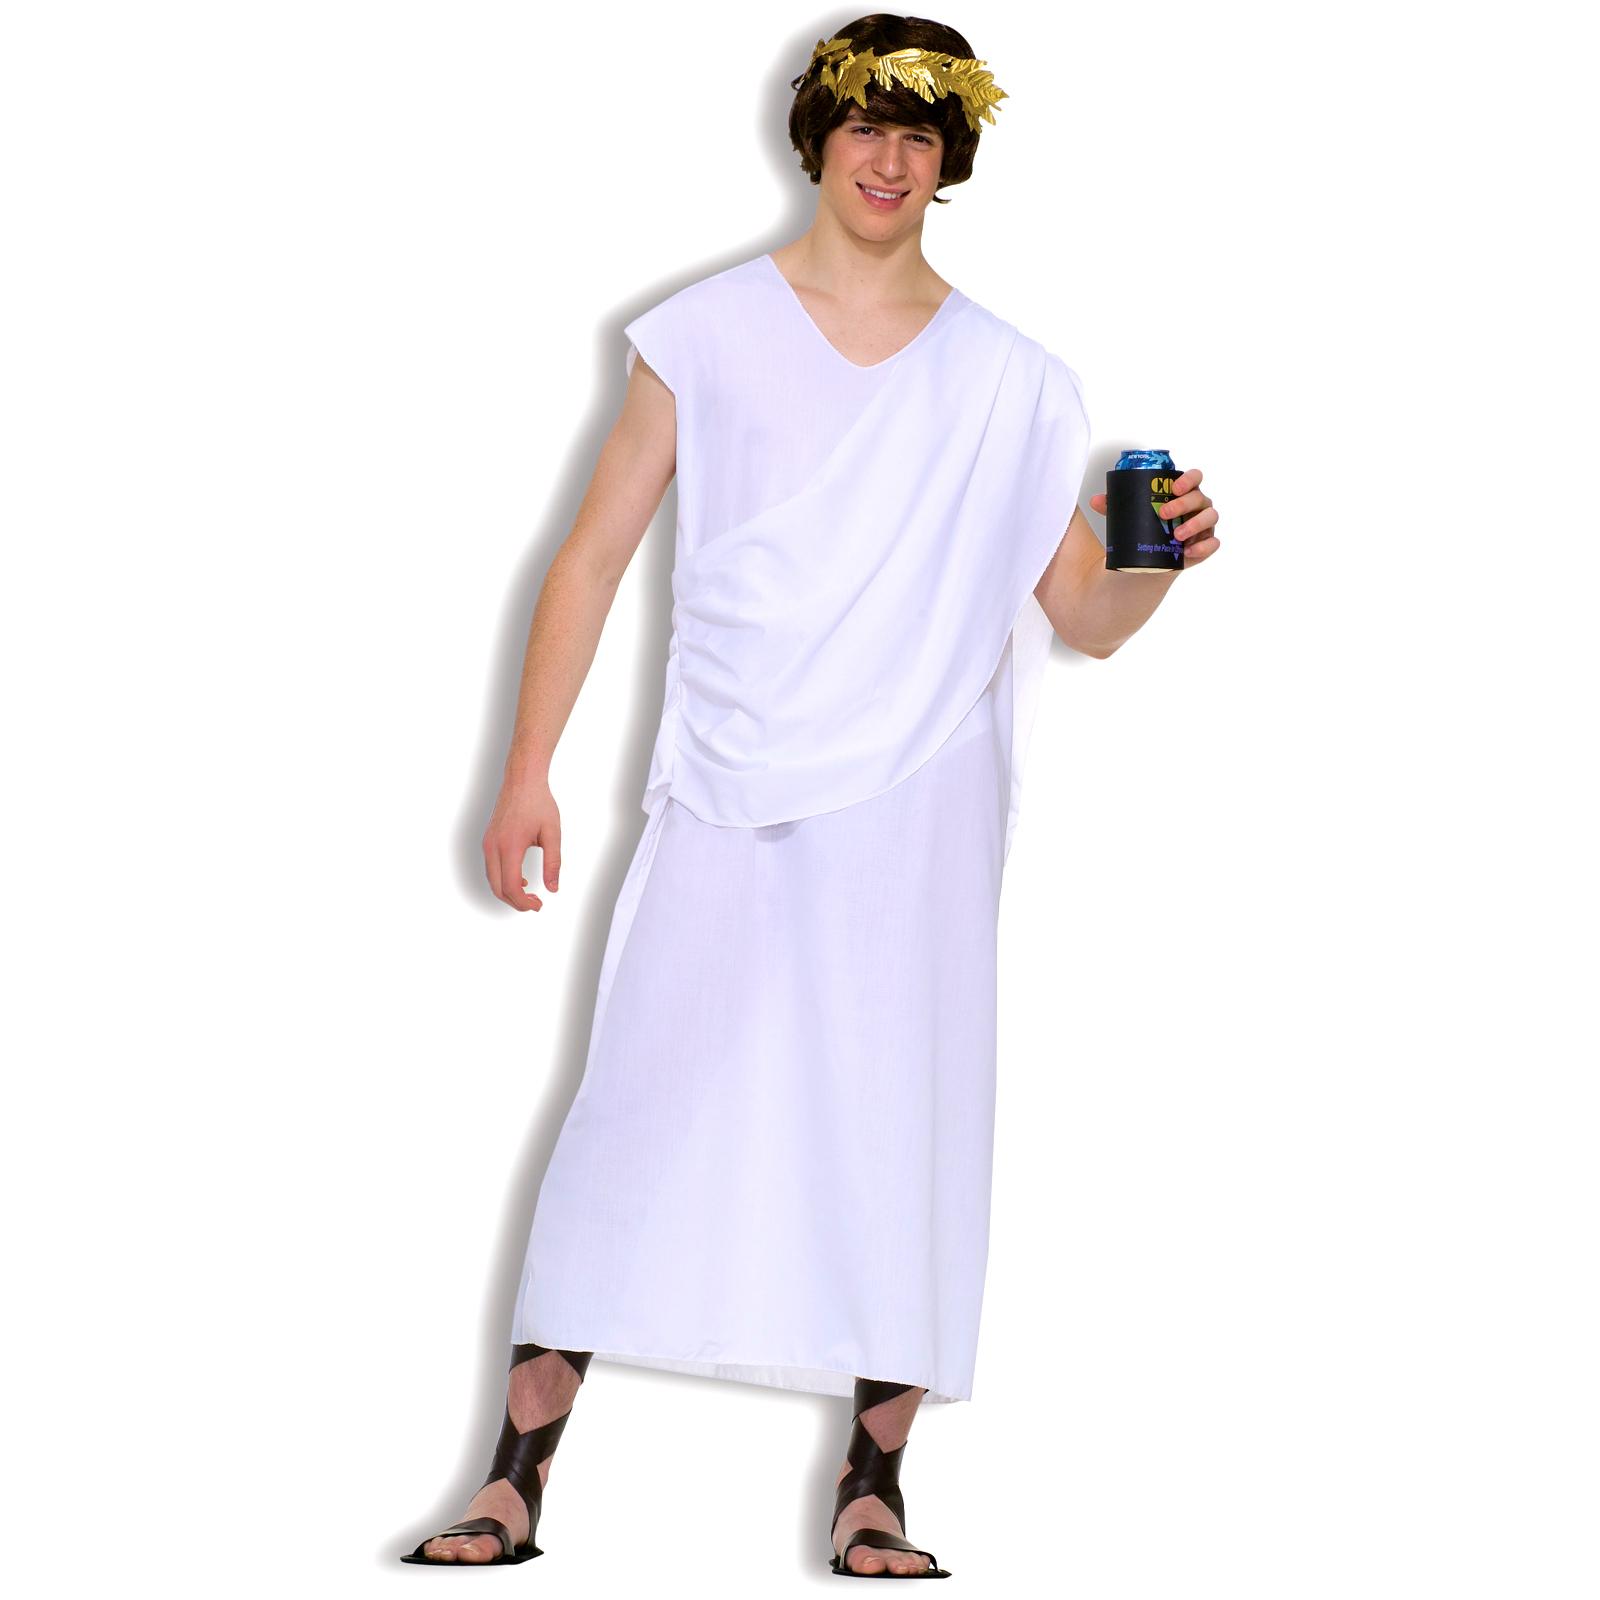 Toga Teen Costume